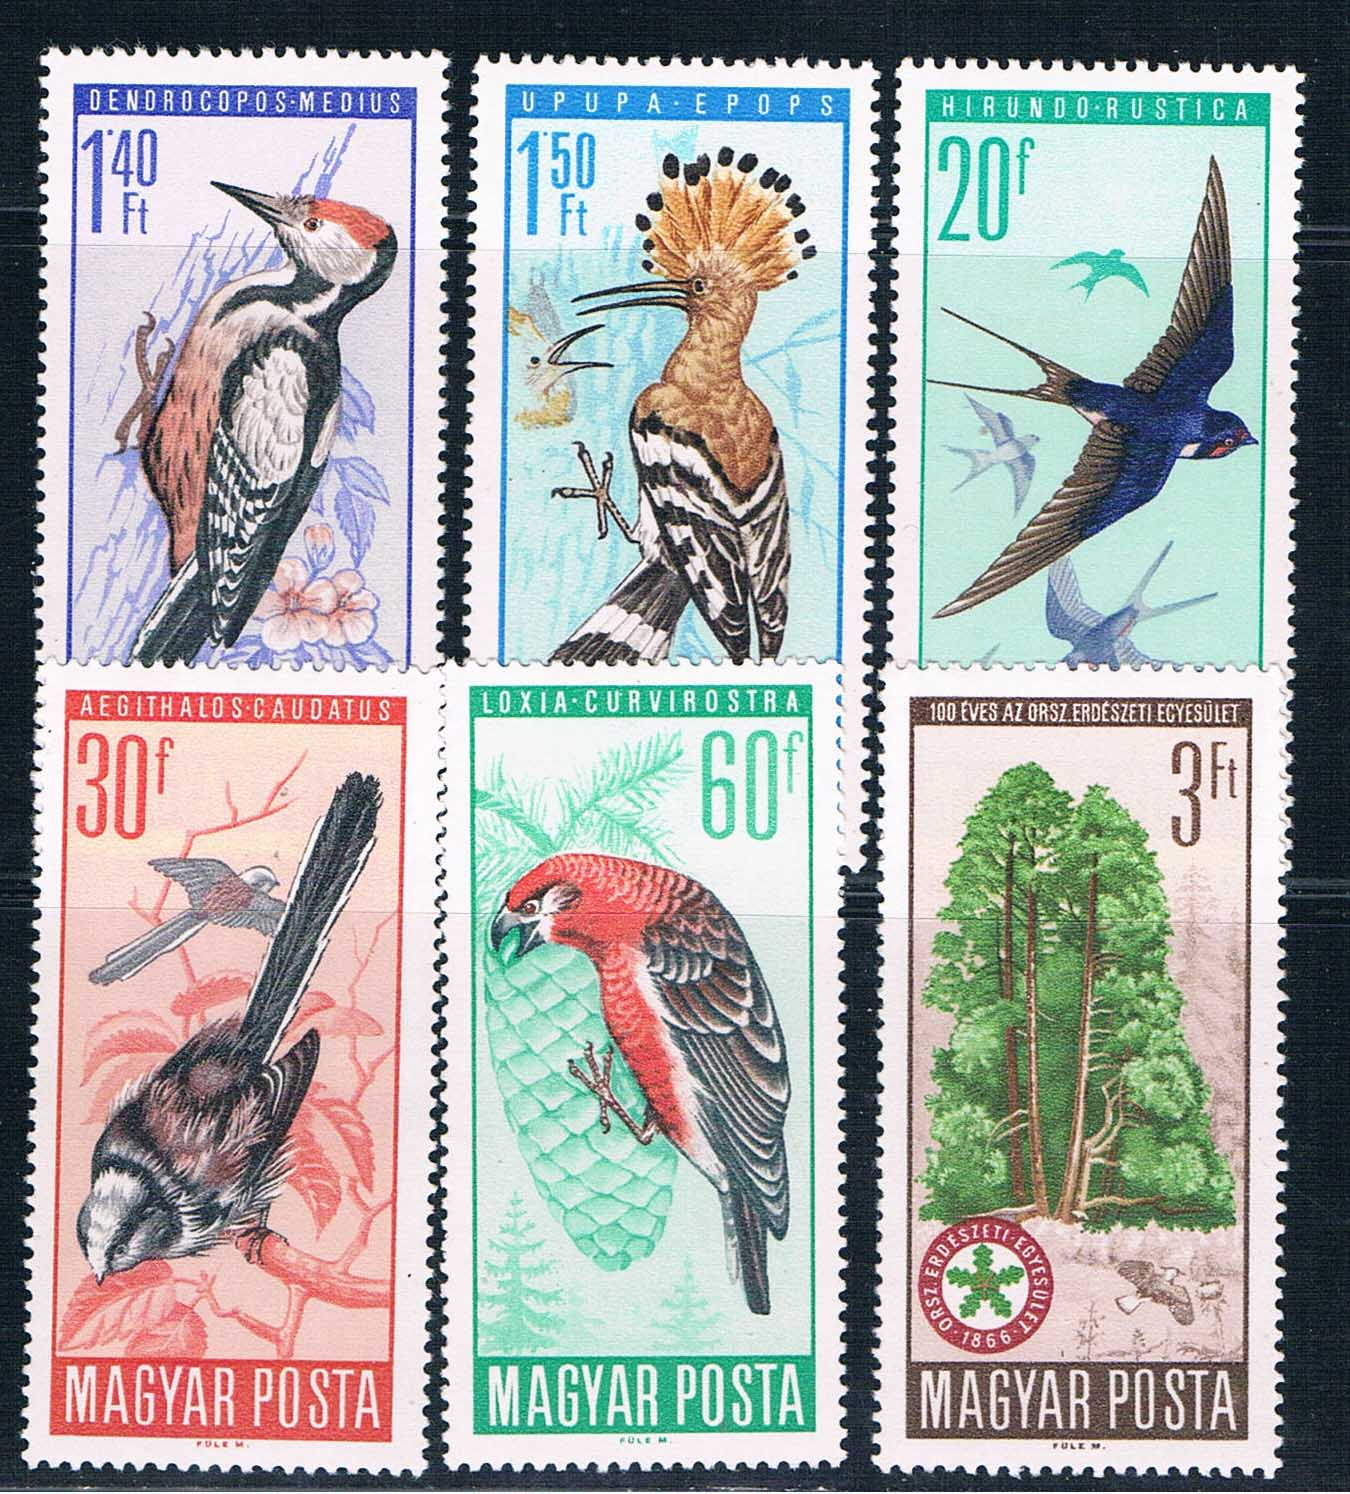 H0067 Hungary 1966 birds 6 new 1219 hungary